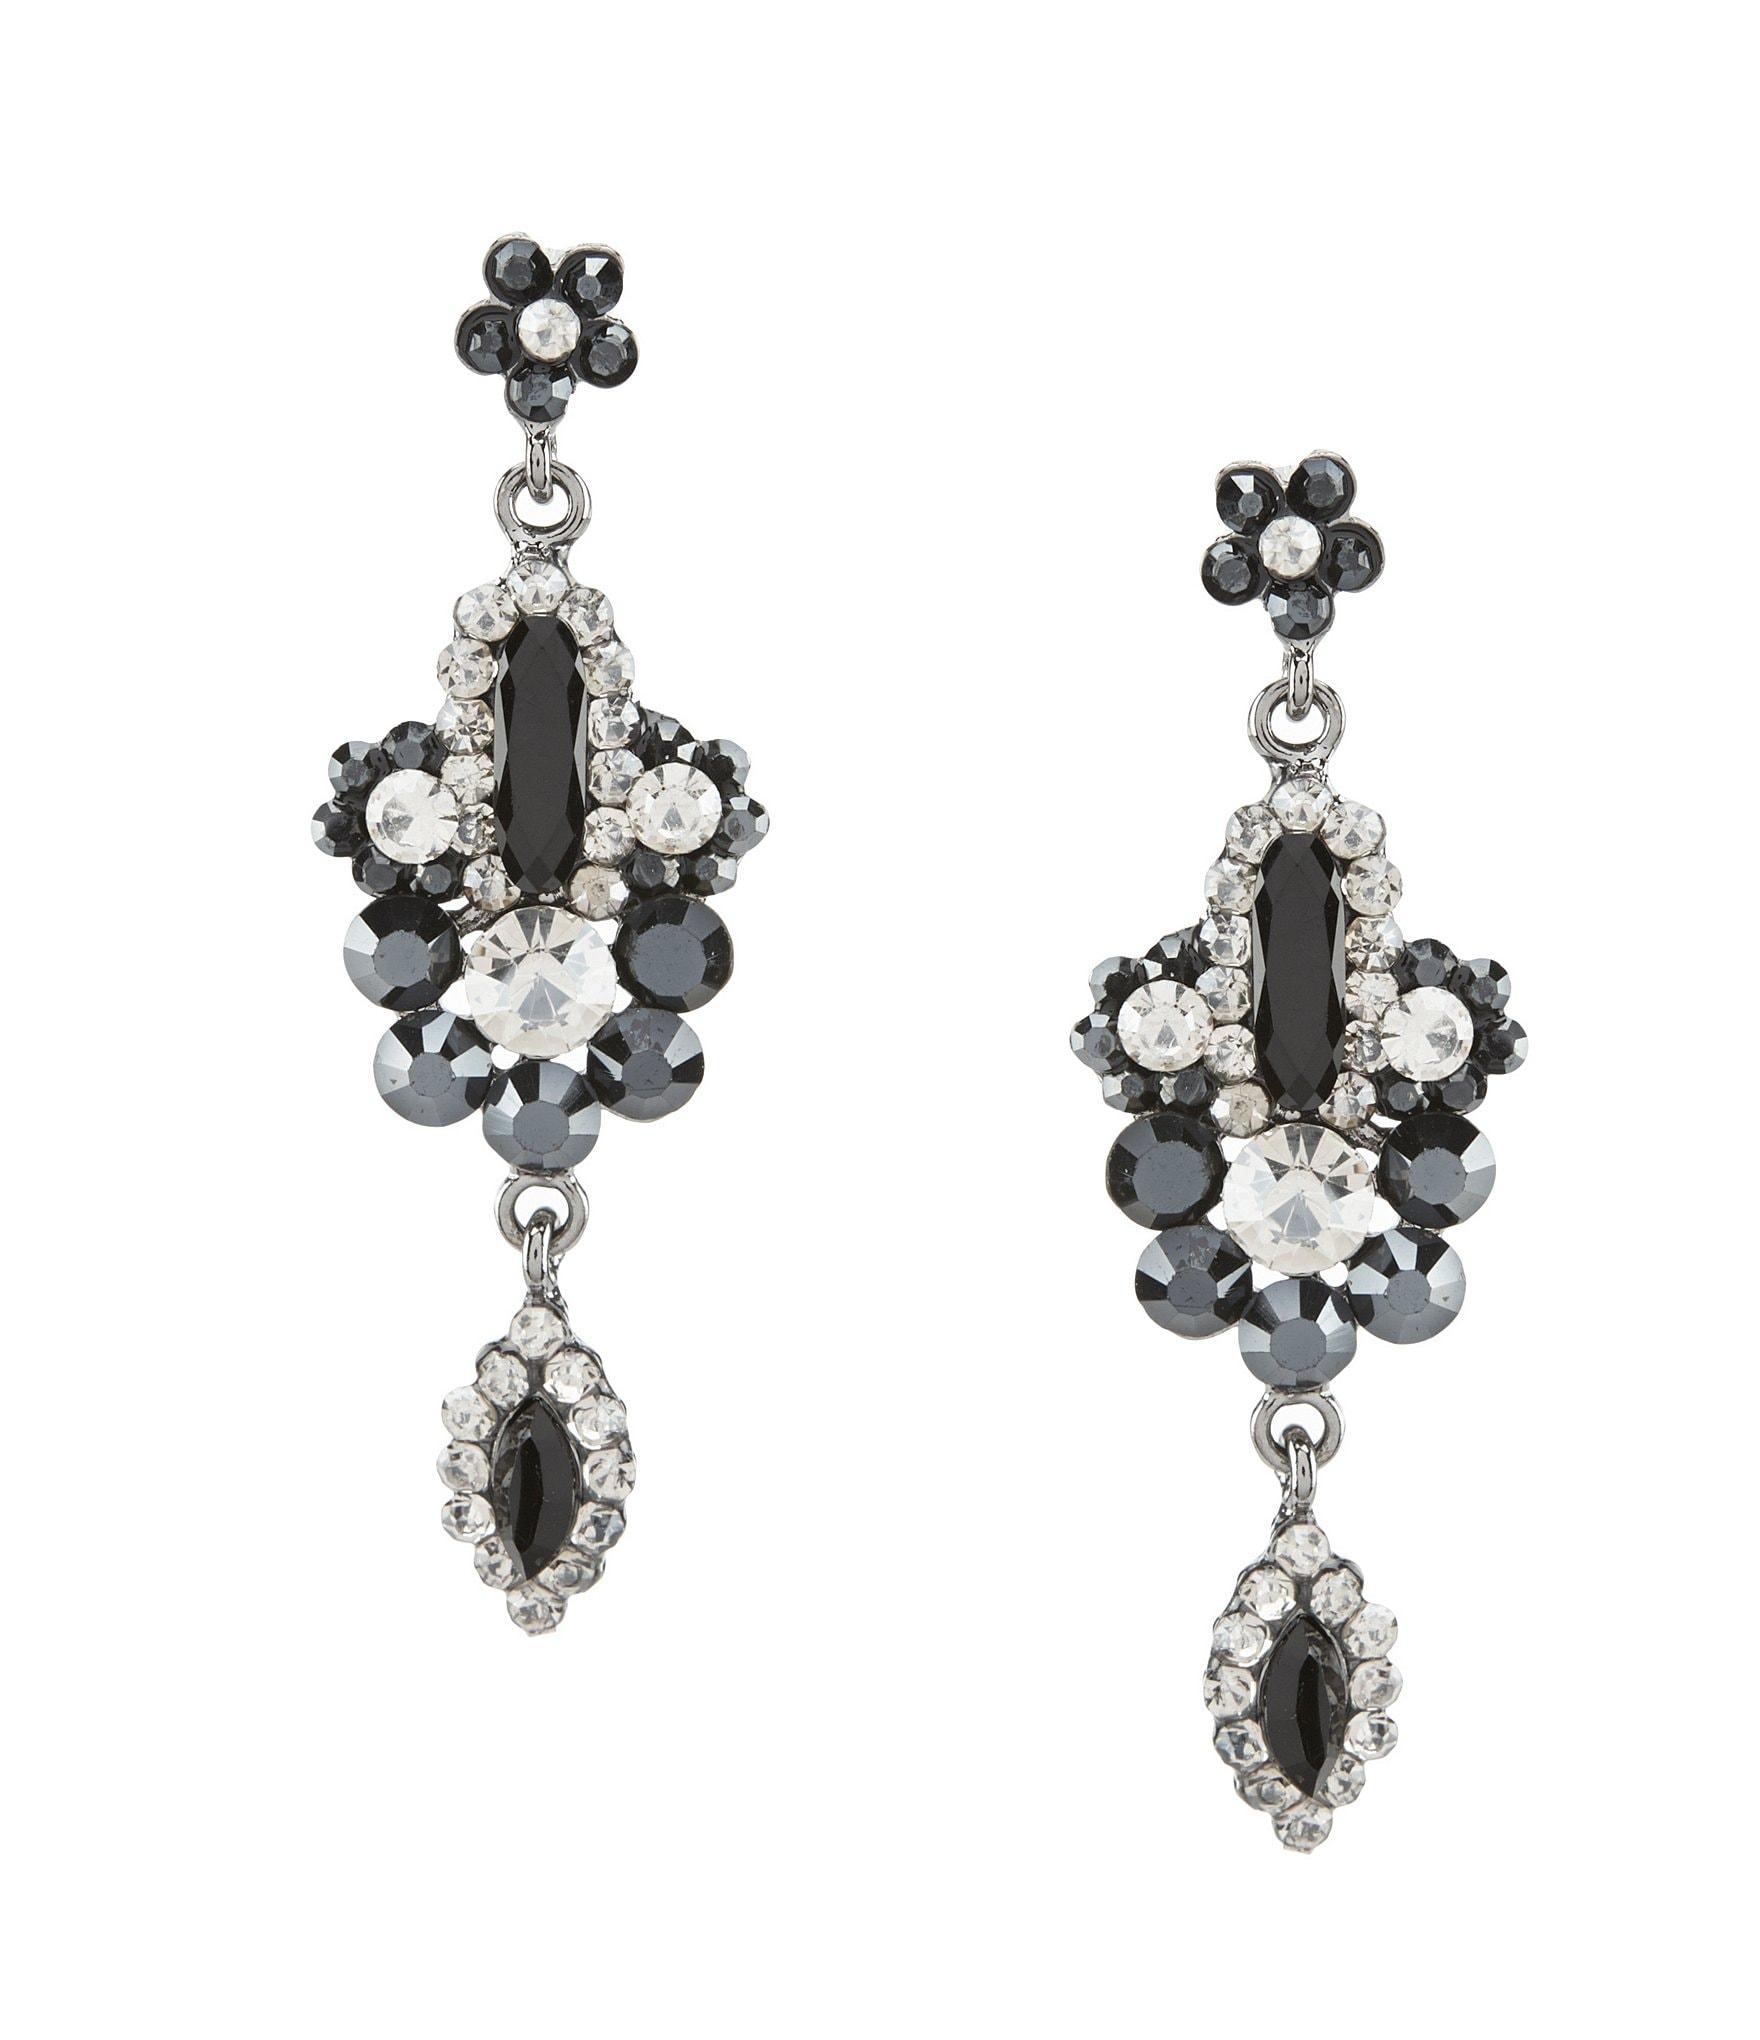 Accessories | Jewelry | Crystal & Rhinestone Jewelry | Earrings ...